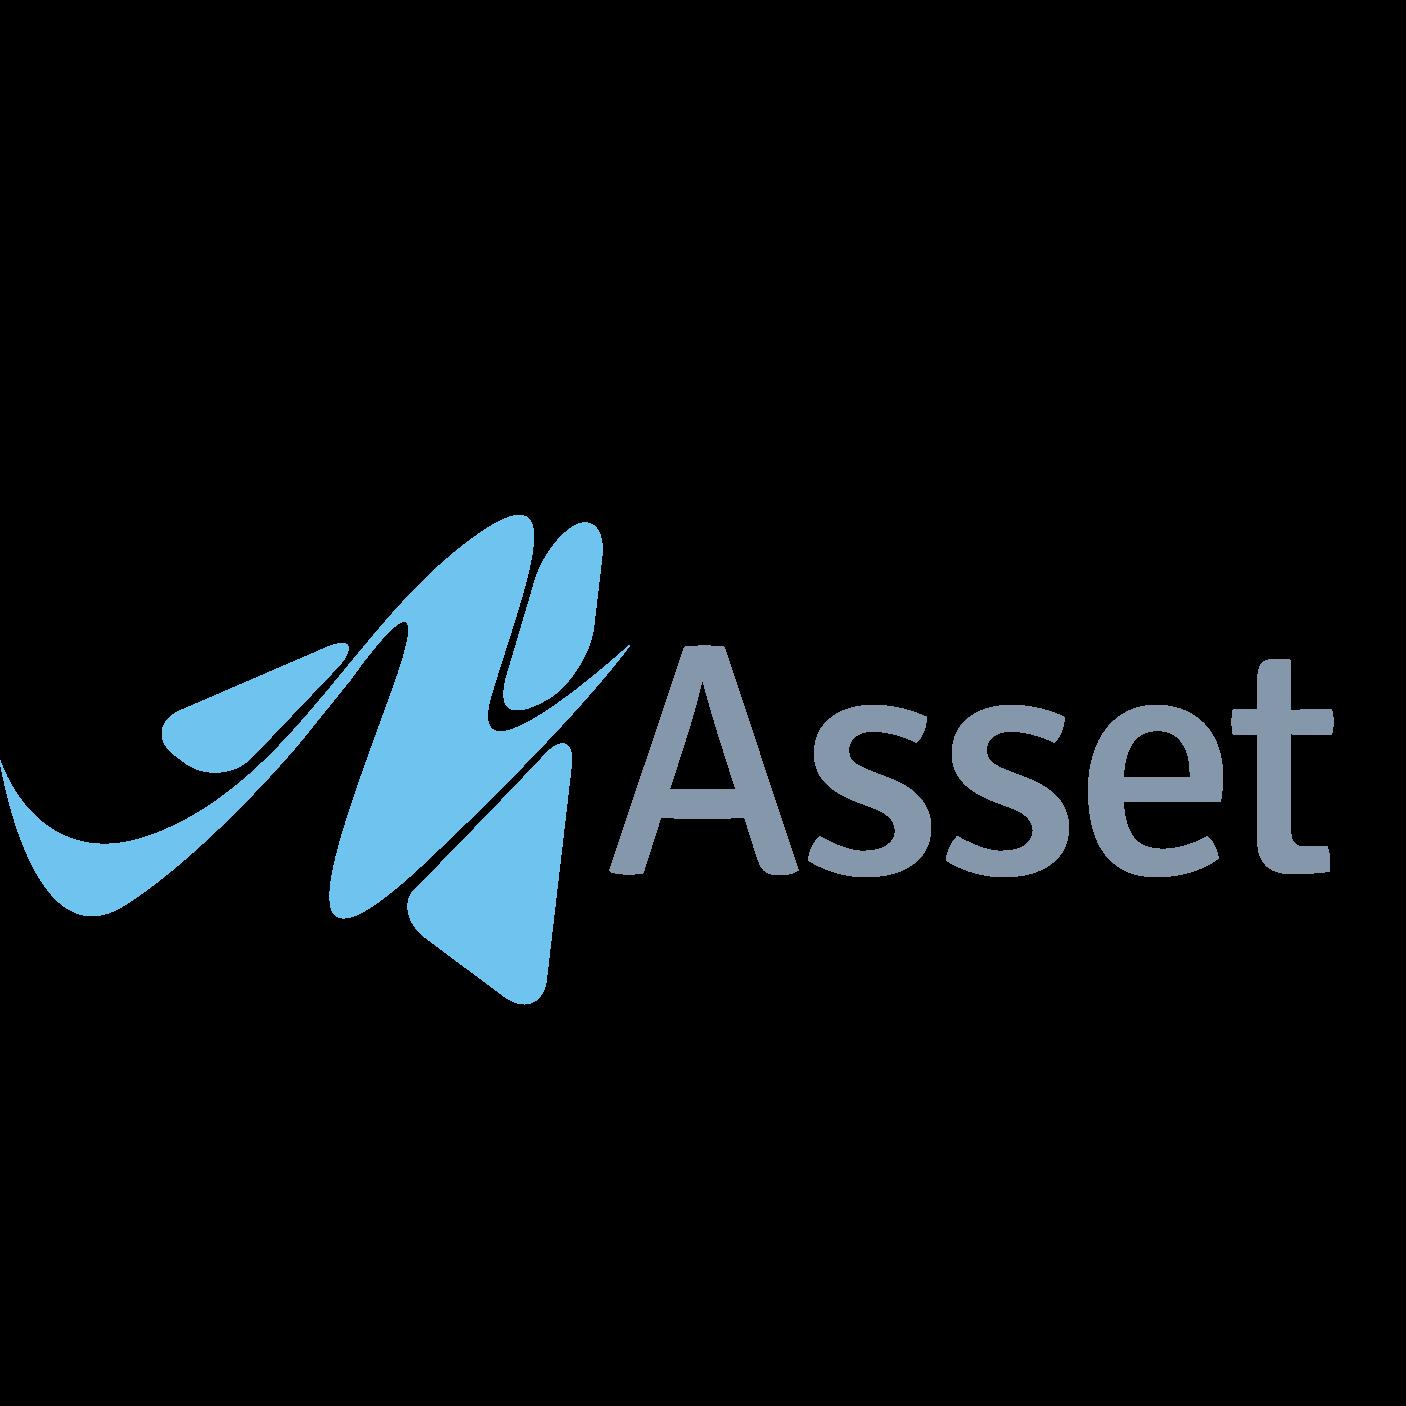 Asset Marketing Systems